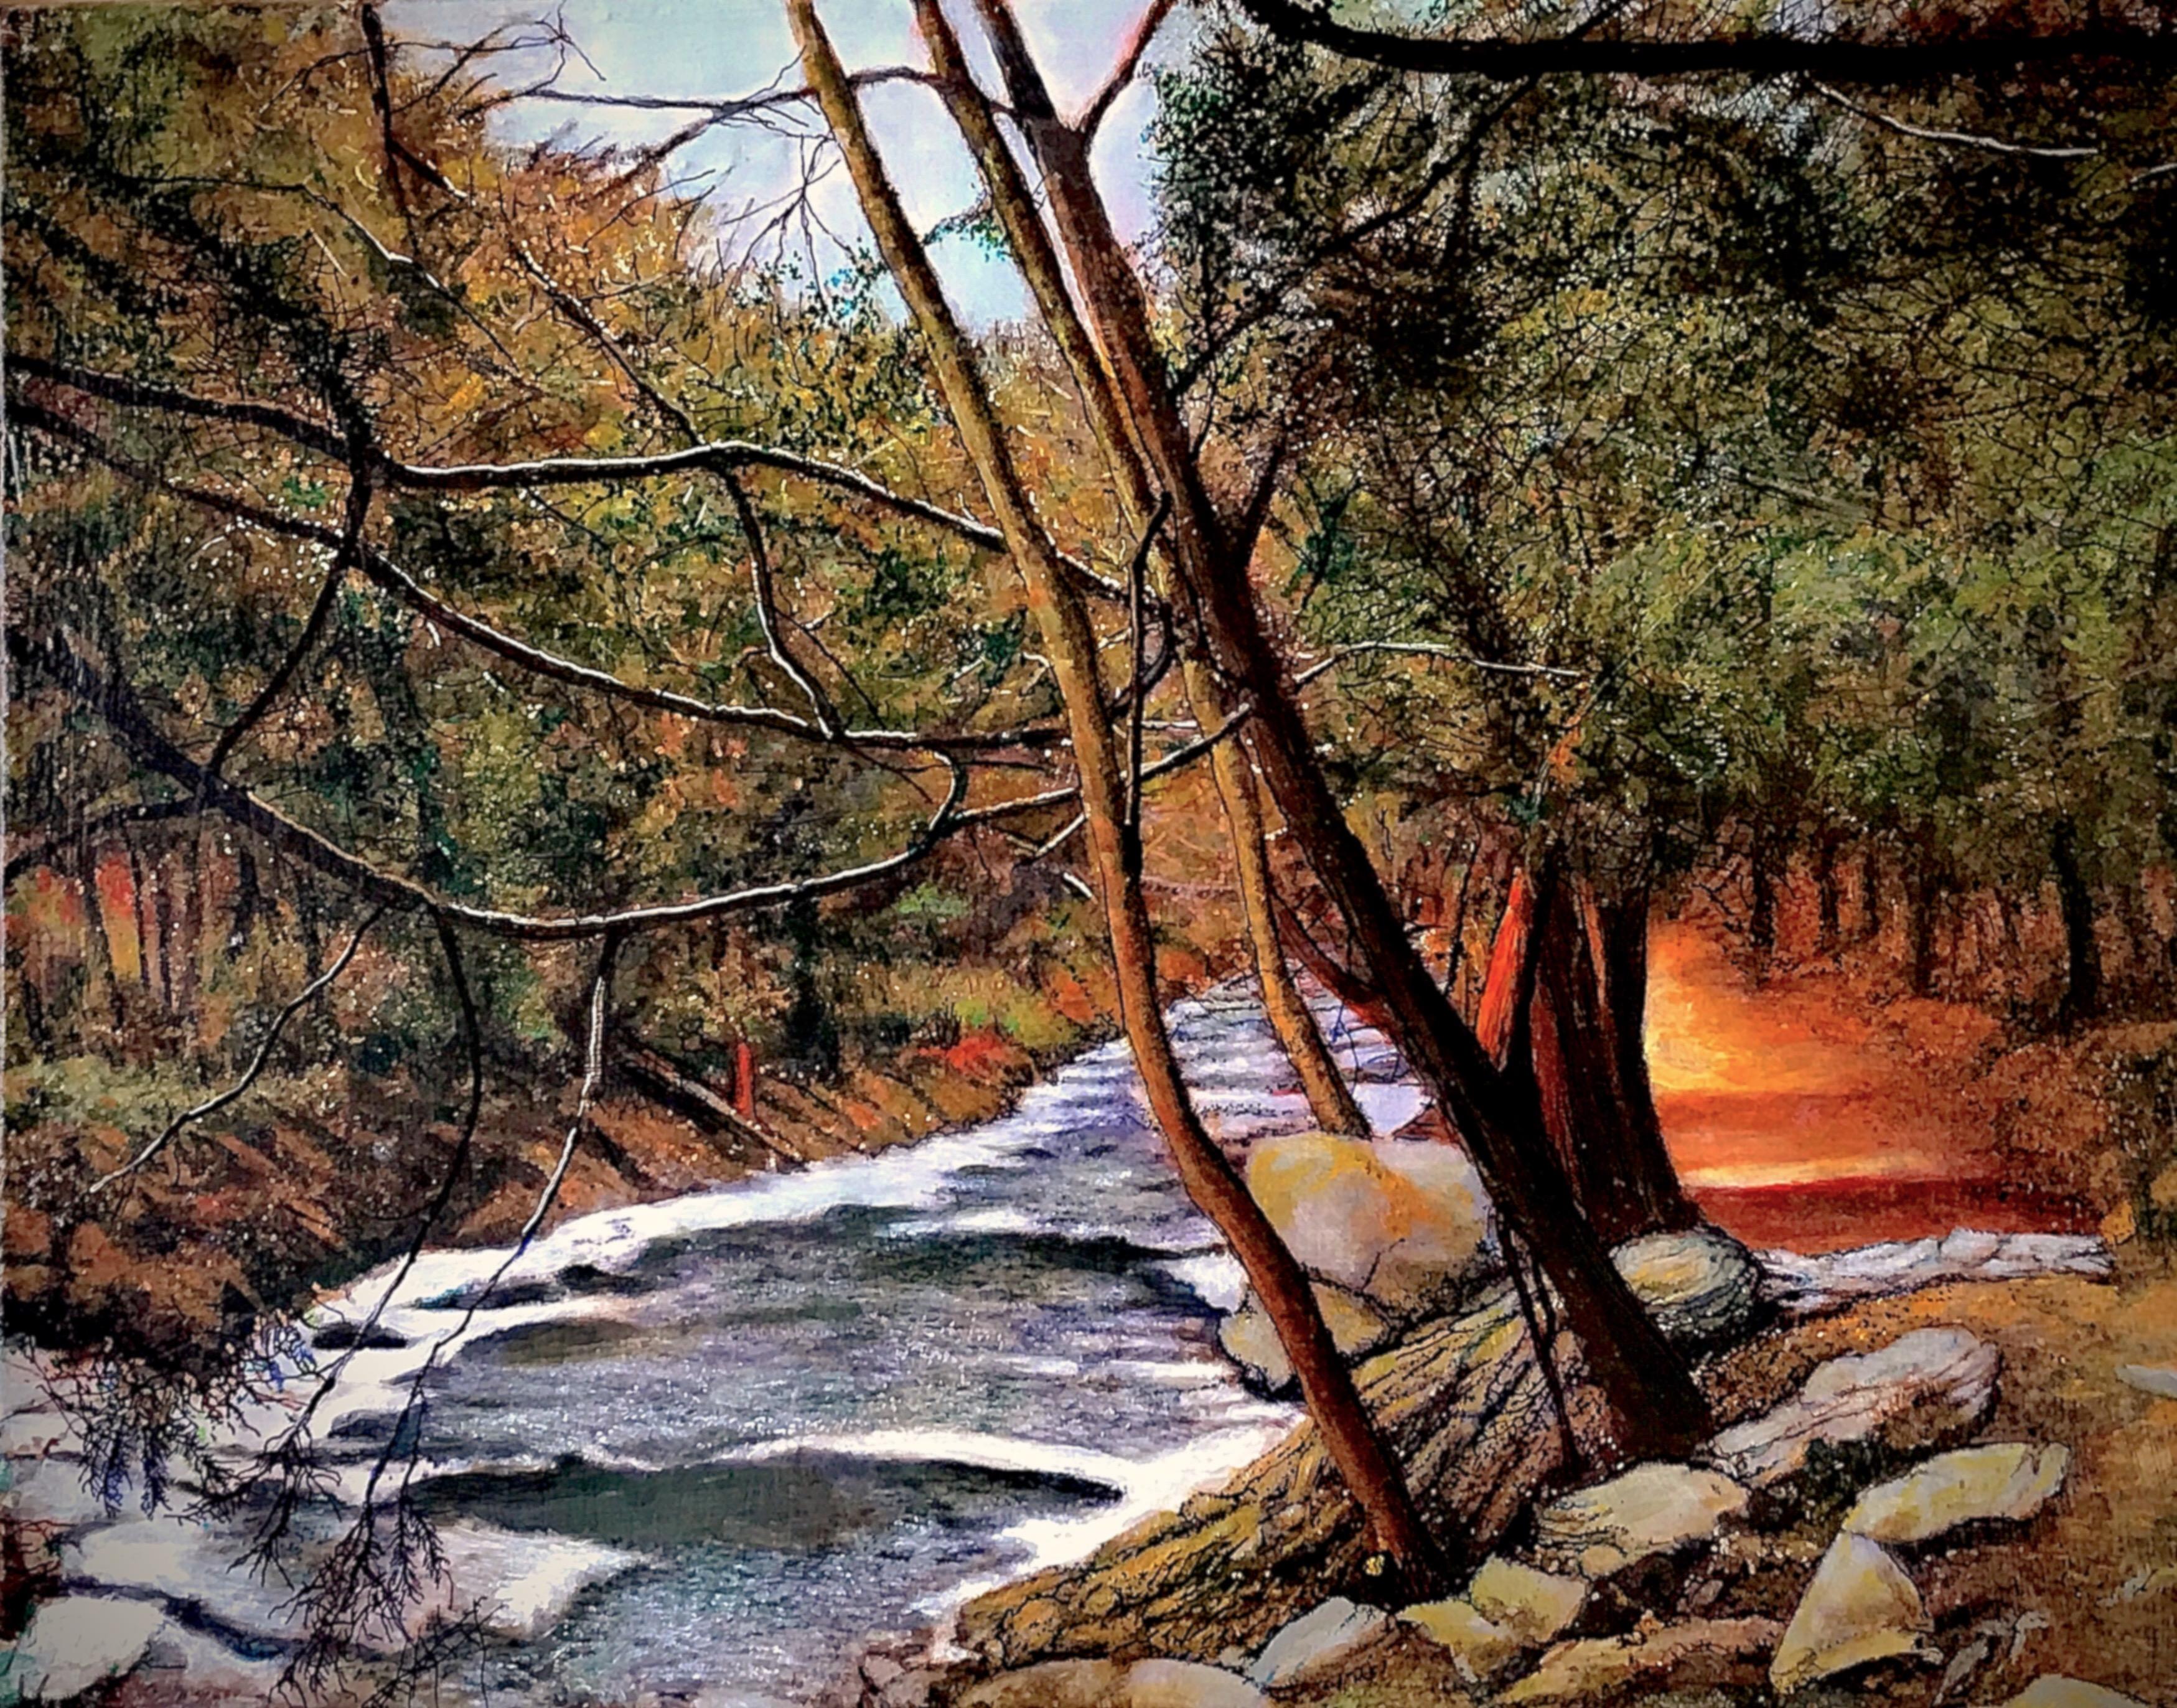 The Bash Bish River